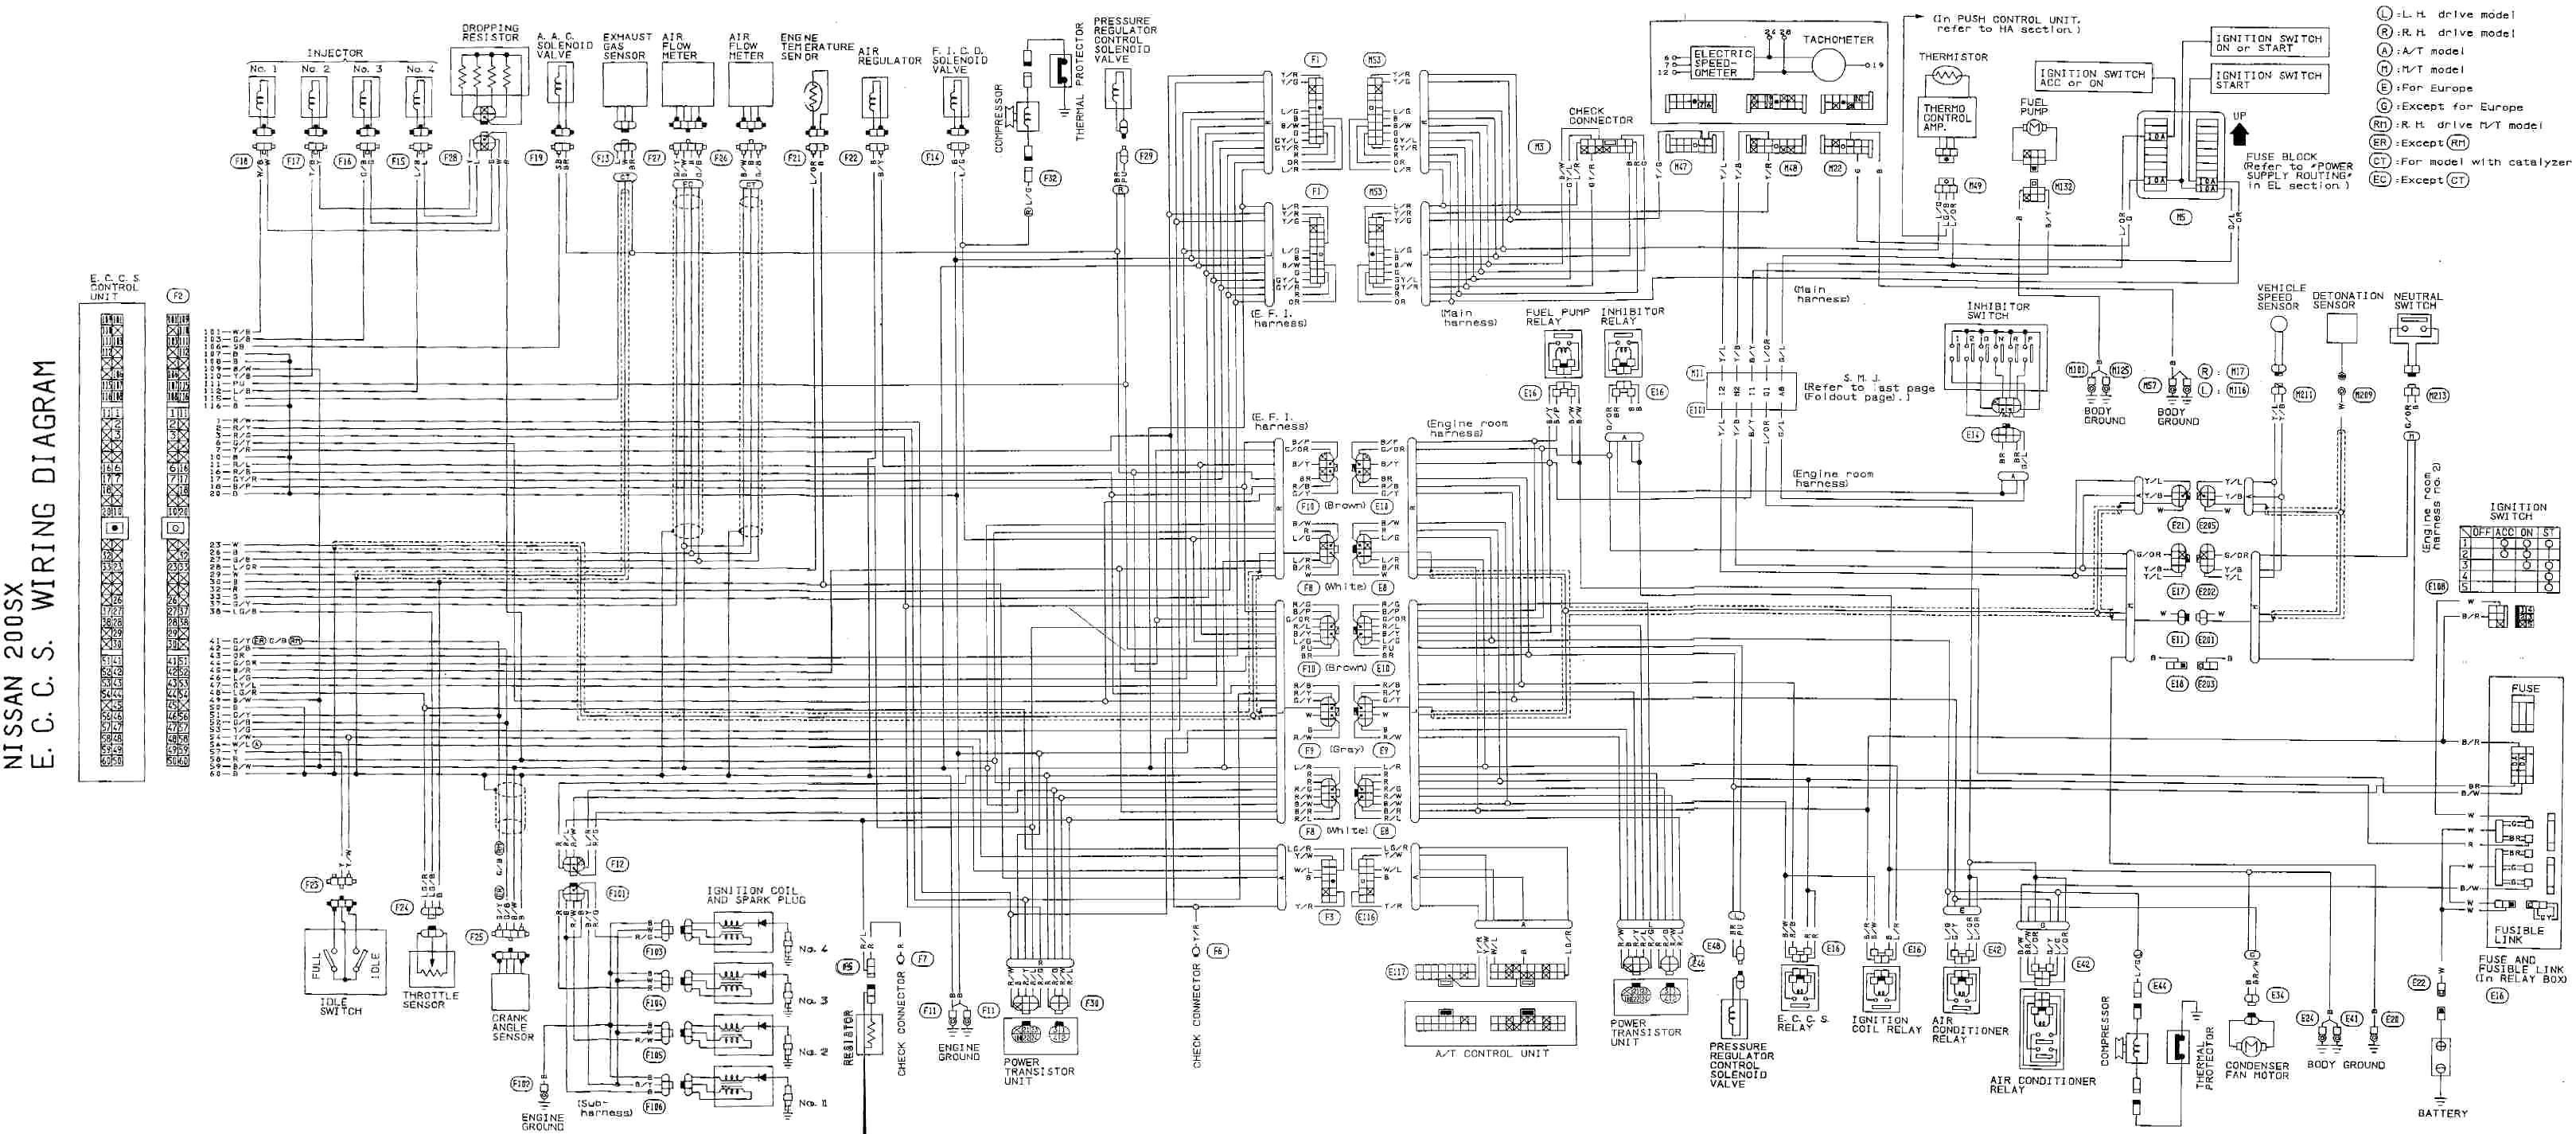 2002 Nissan Pathfinder Engine Diagram Nissan Wiring Harness Diagram Free Picture Schematic Worksheet and Of 2002 Nissan Pathfinder Engine Diagram